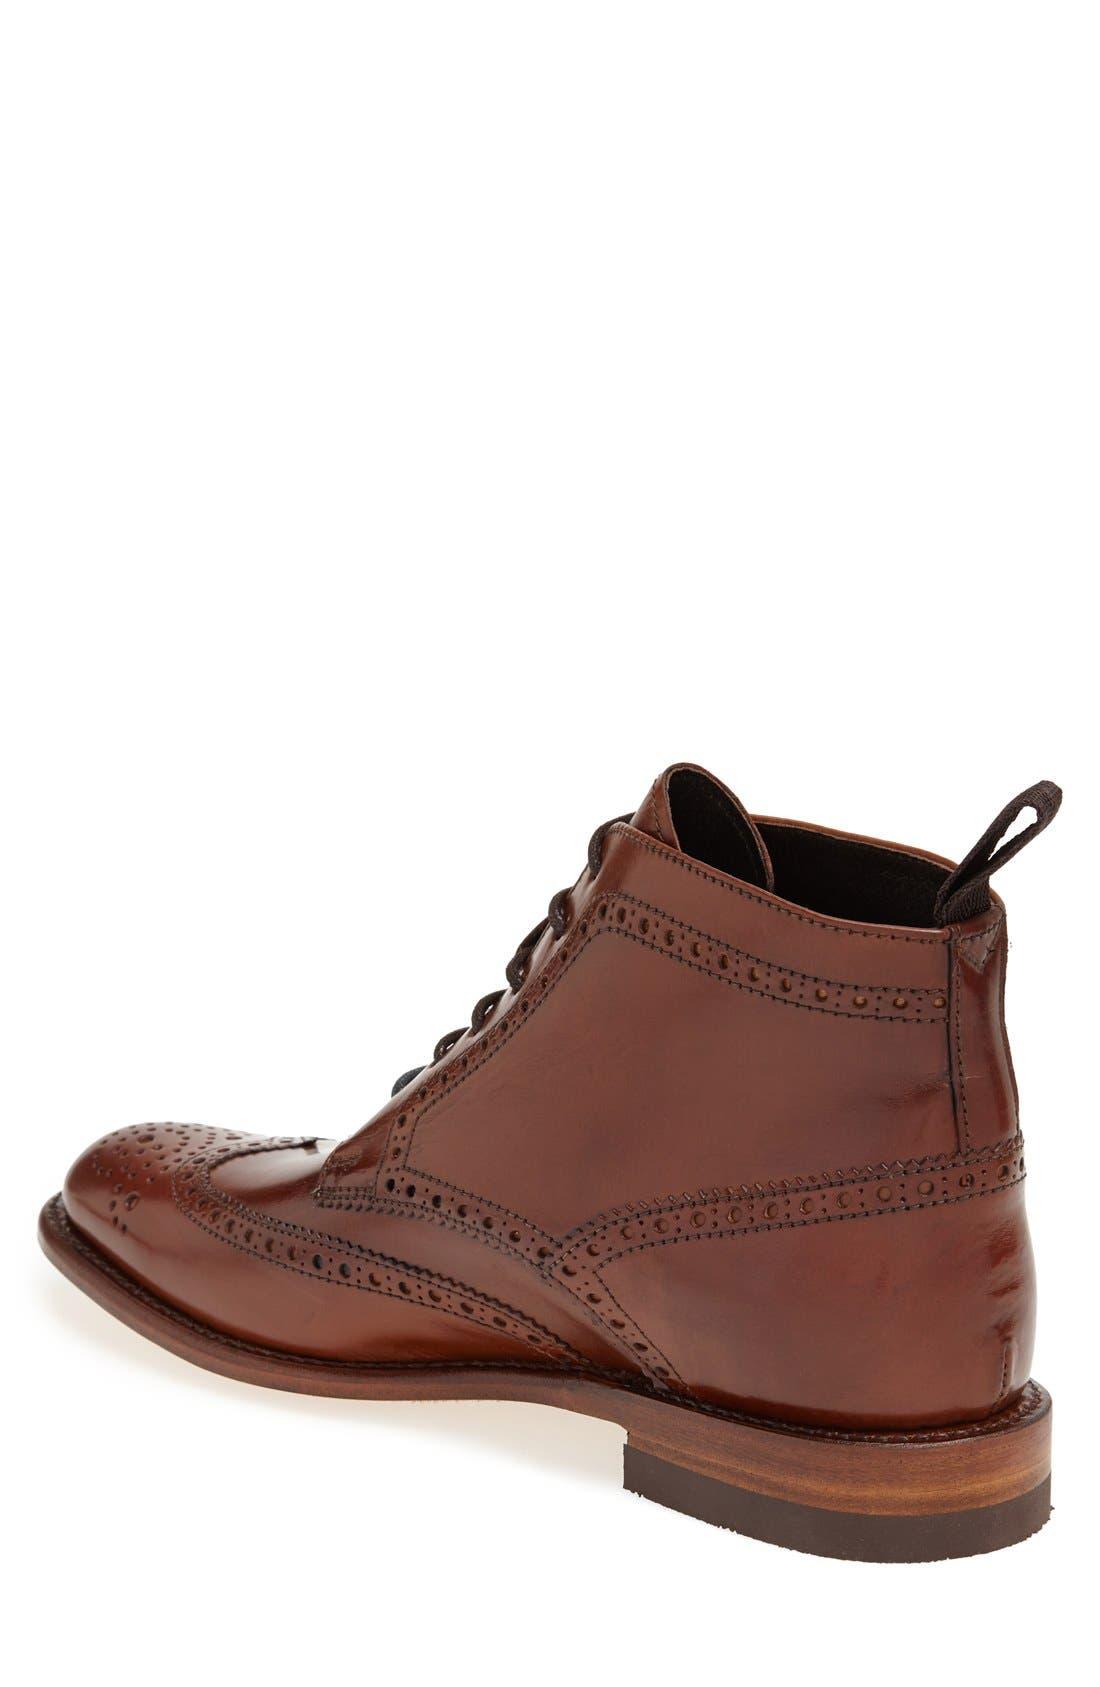 'Newport' Wingtip Boot,                             Alternate thumbnail 2, color,                             Cognac